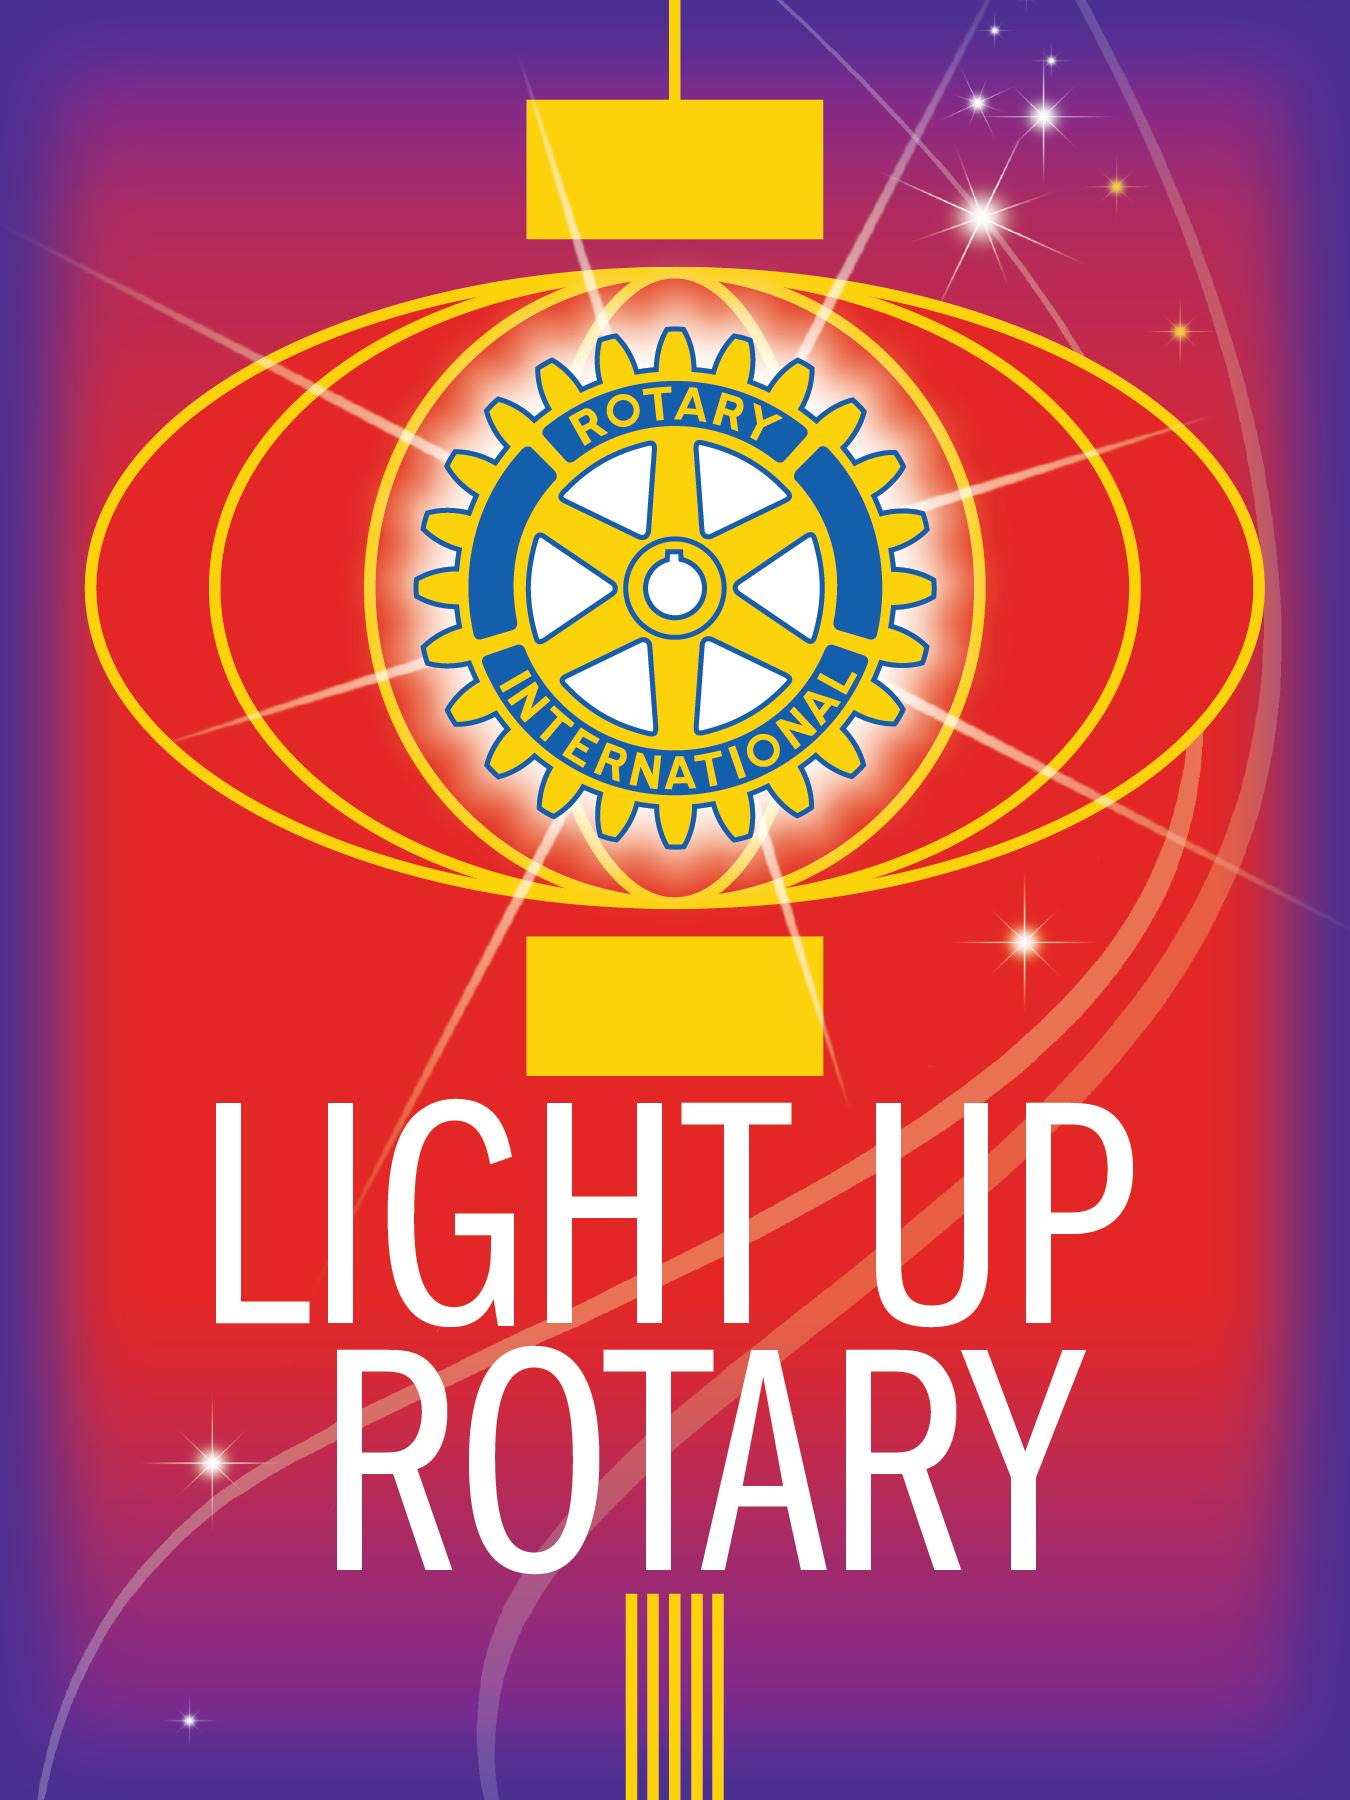 2014-2015 logo